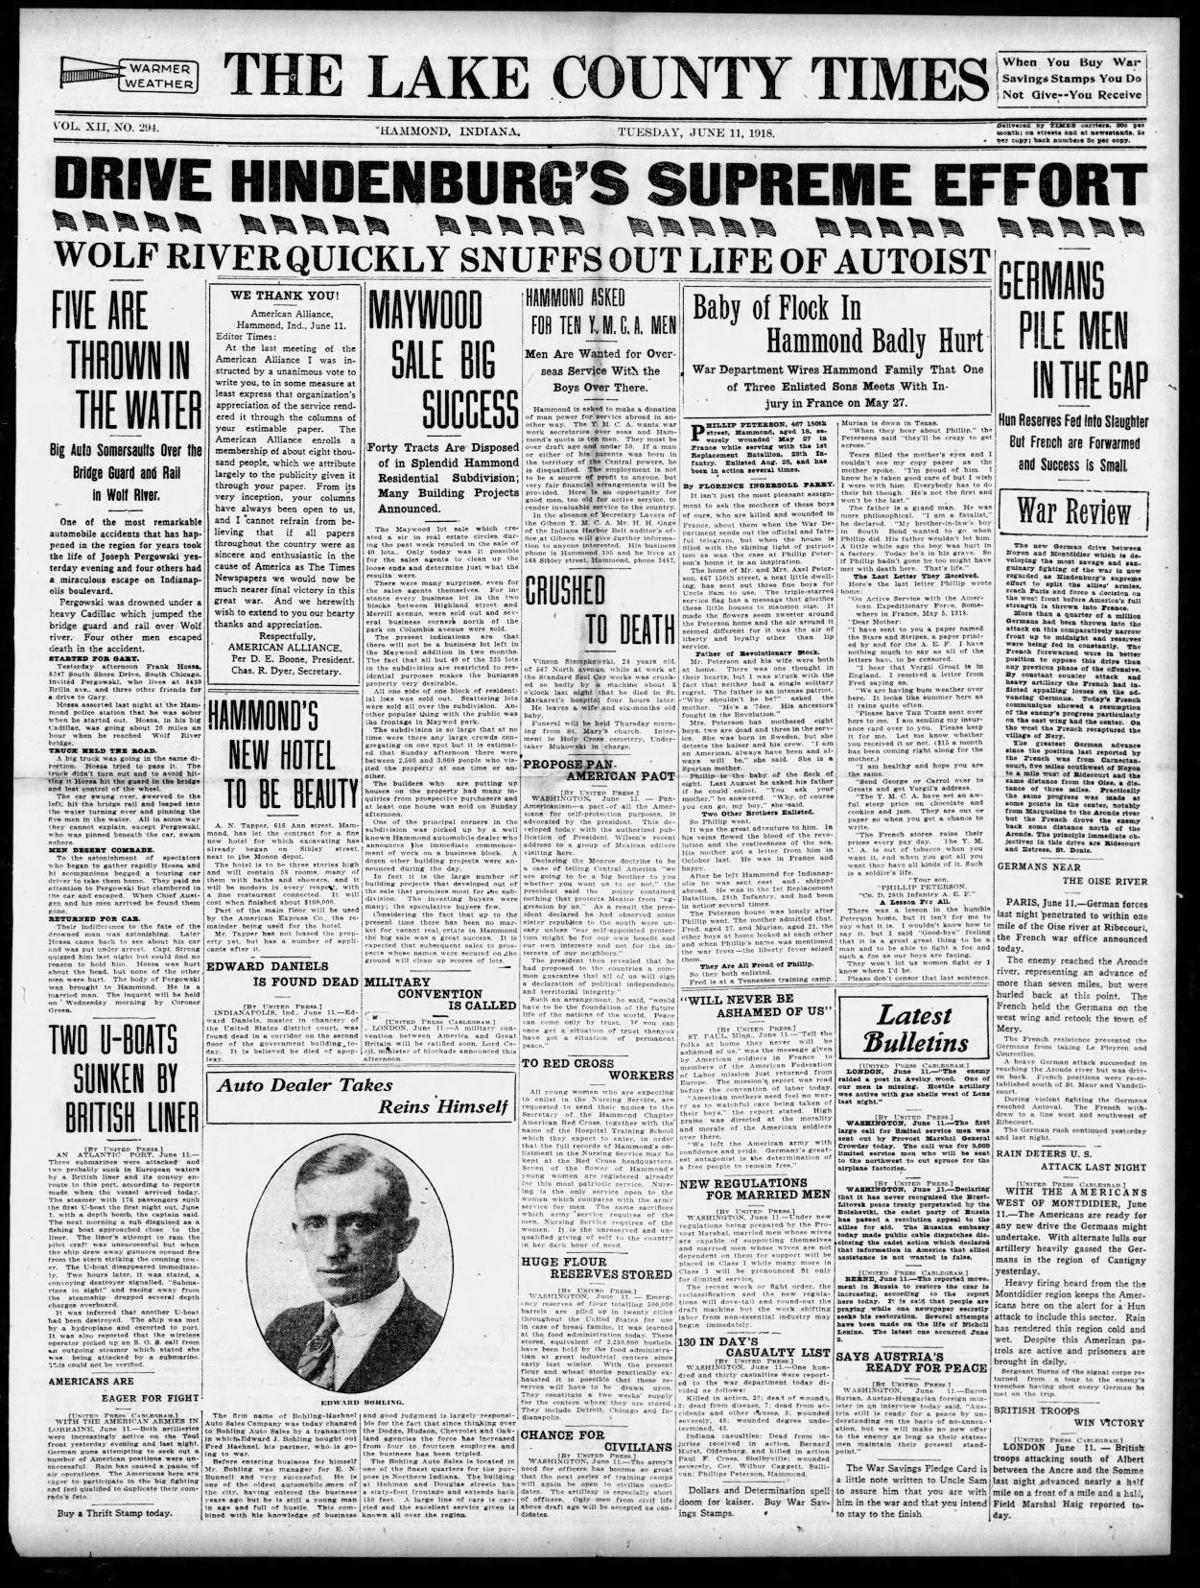 June 11, 1918: Hammond's New Hotel To Be Beauty